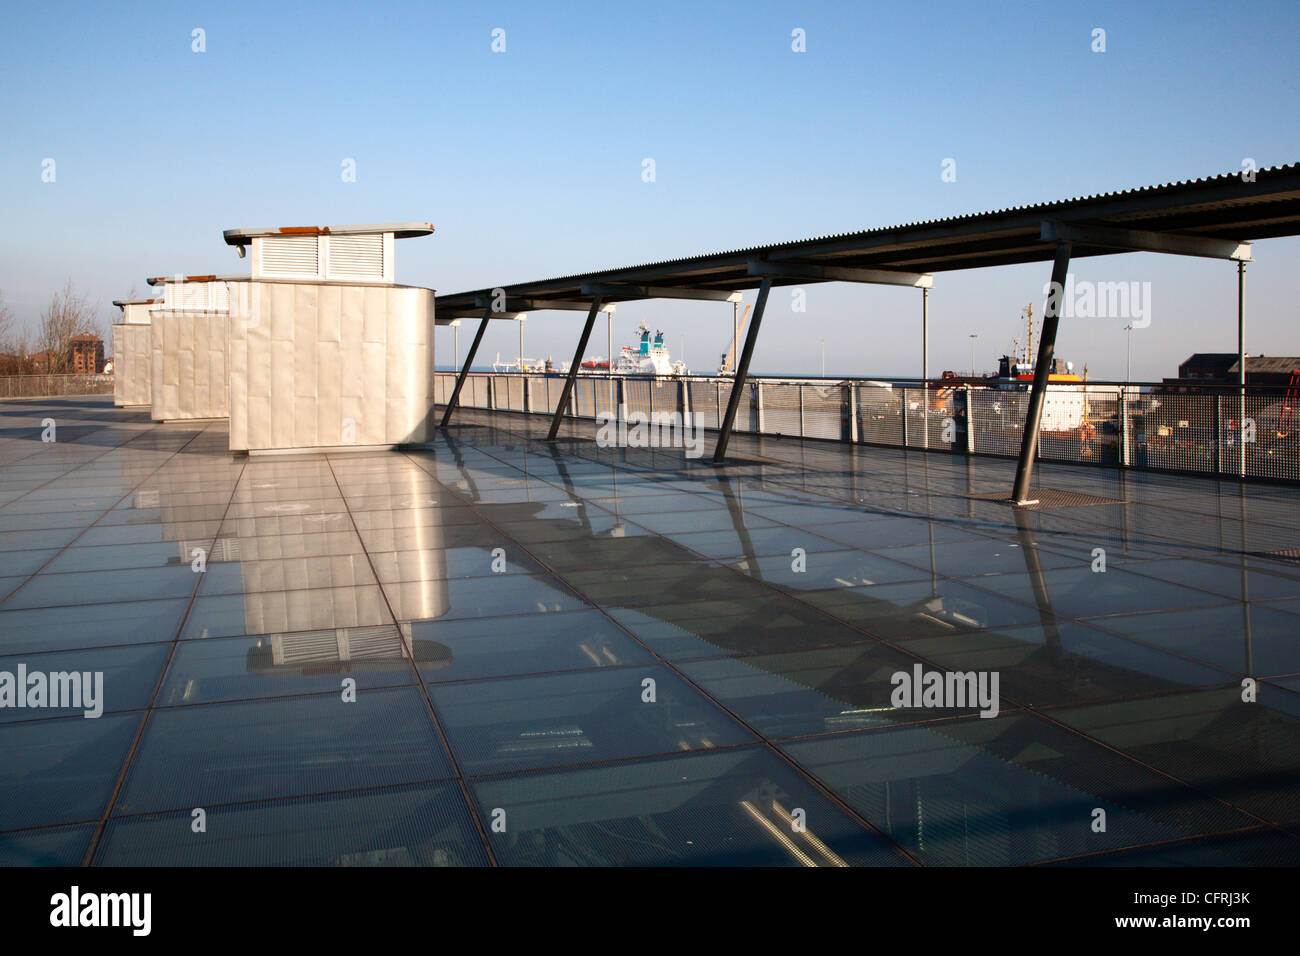 Glass Roof at University of Sunderland National Glass Centre Sunderland England - Stock Image